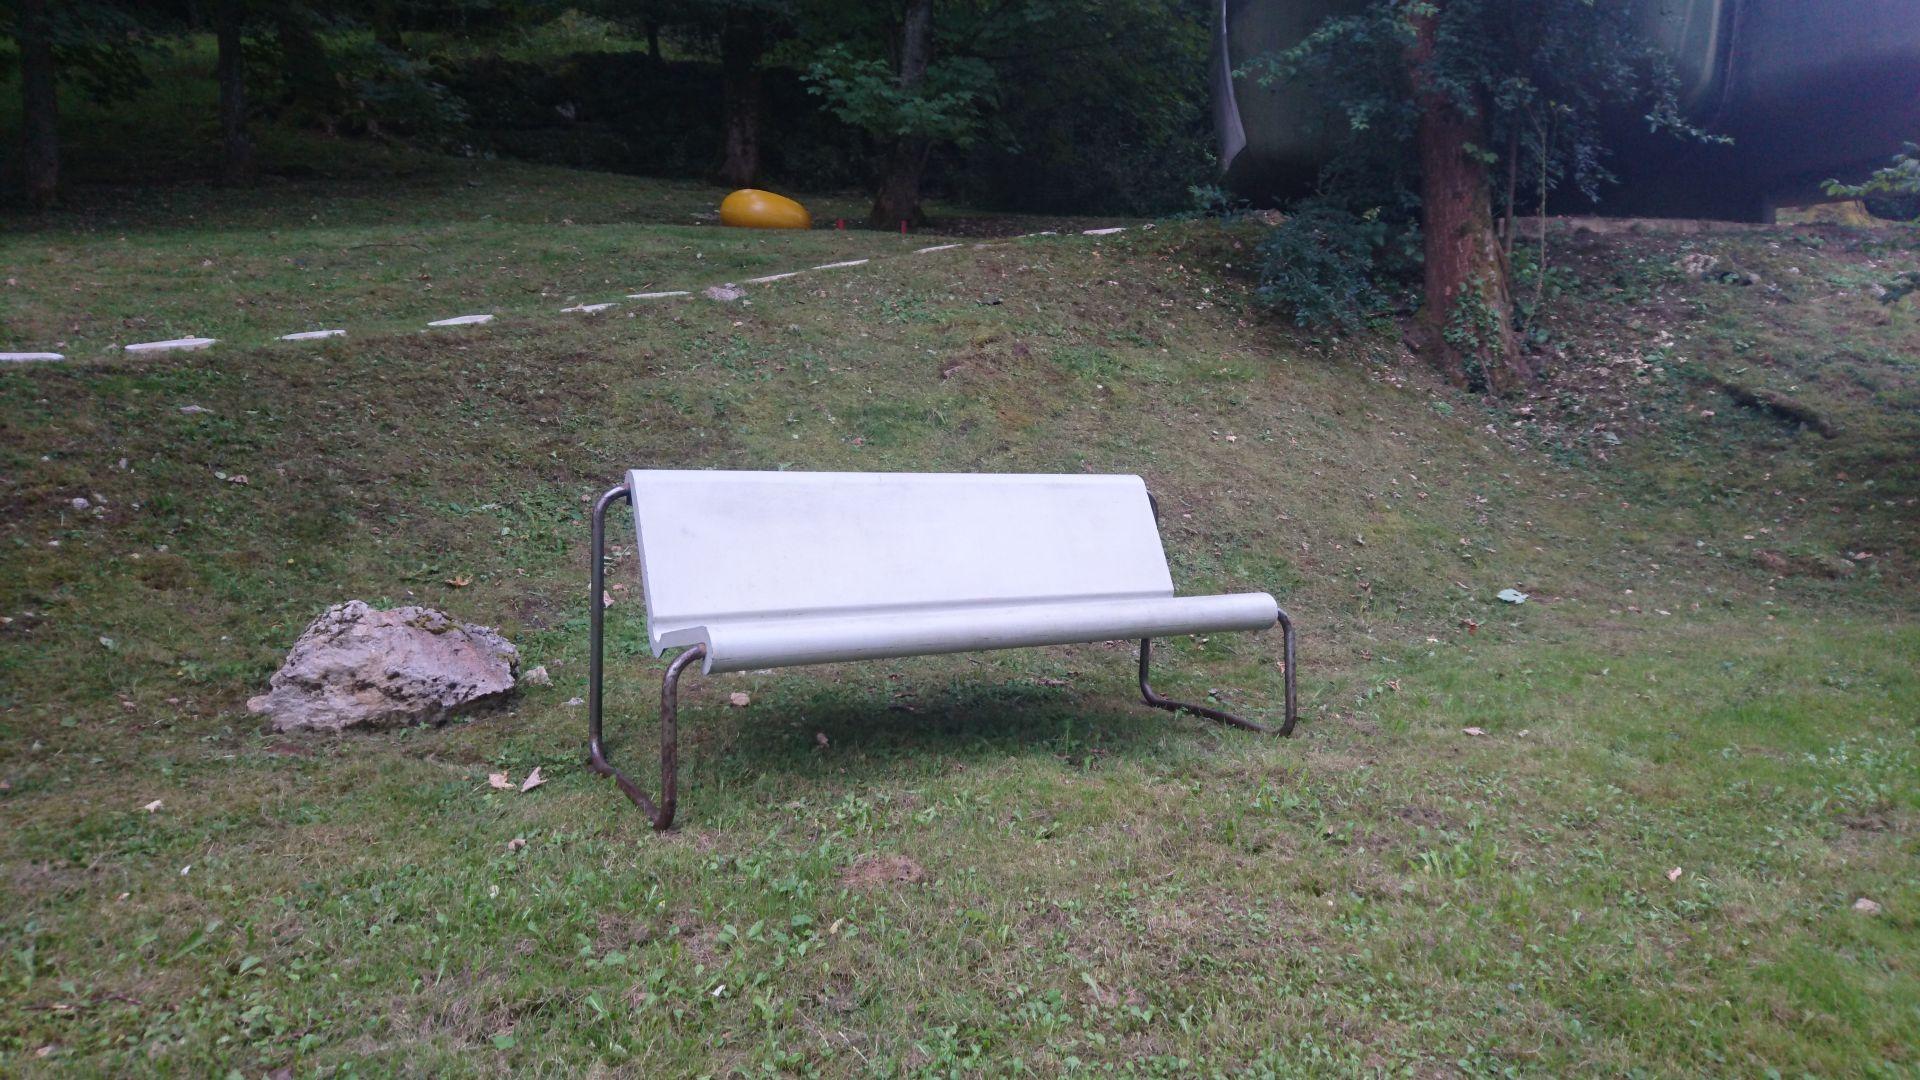 Fiberglass Garden Bench : Vintage fiberglass garden bench by willy guhl for sale at